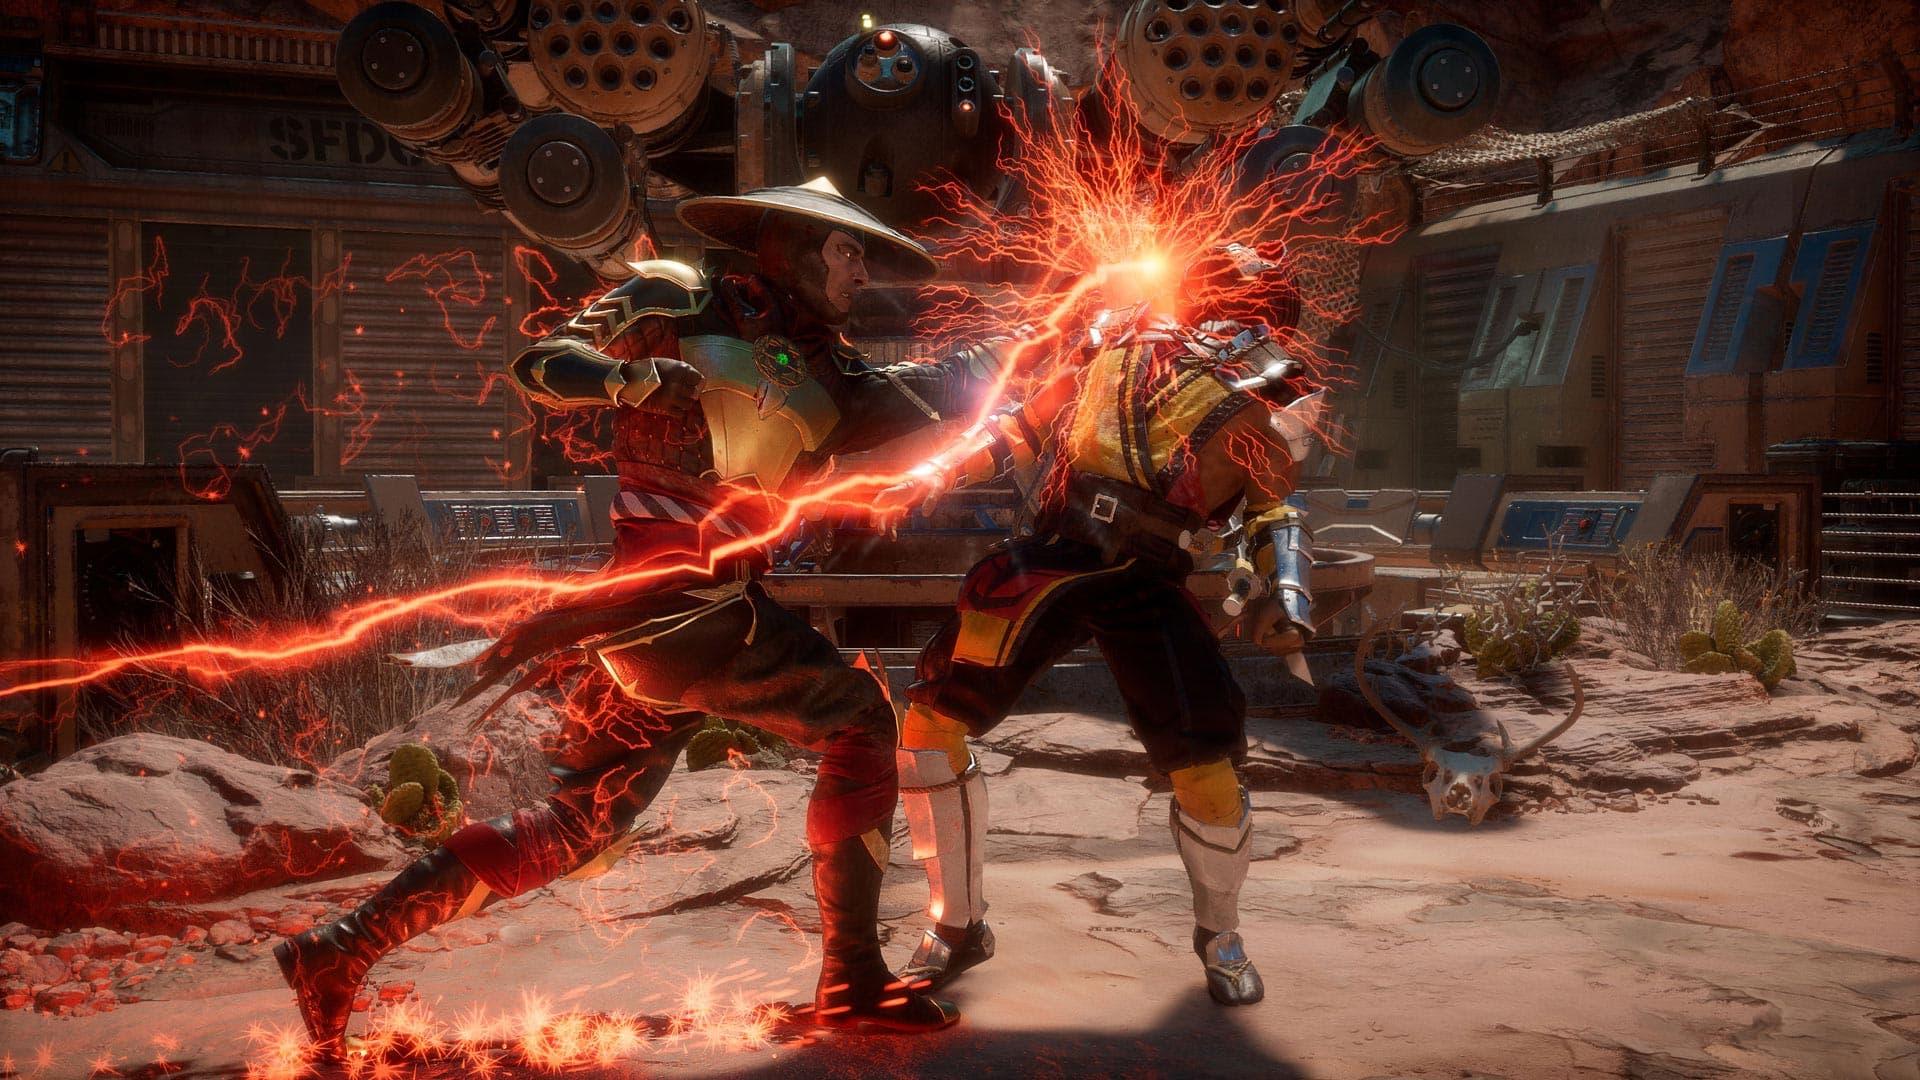 Xbox Series X & S Mortal Kombat 11